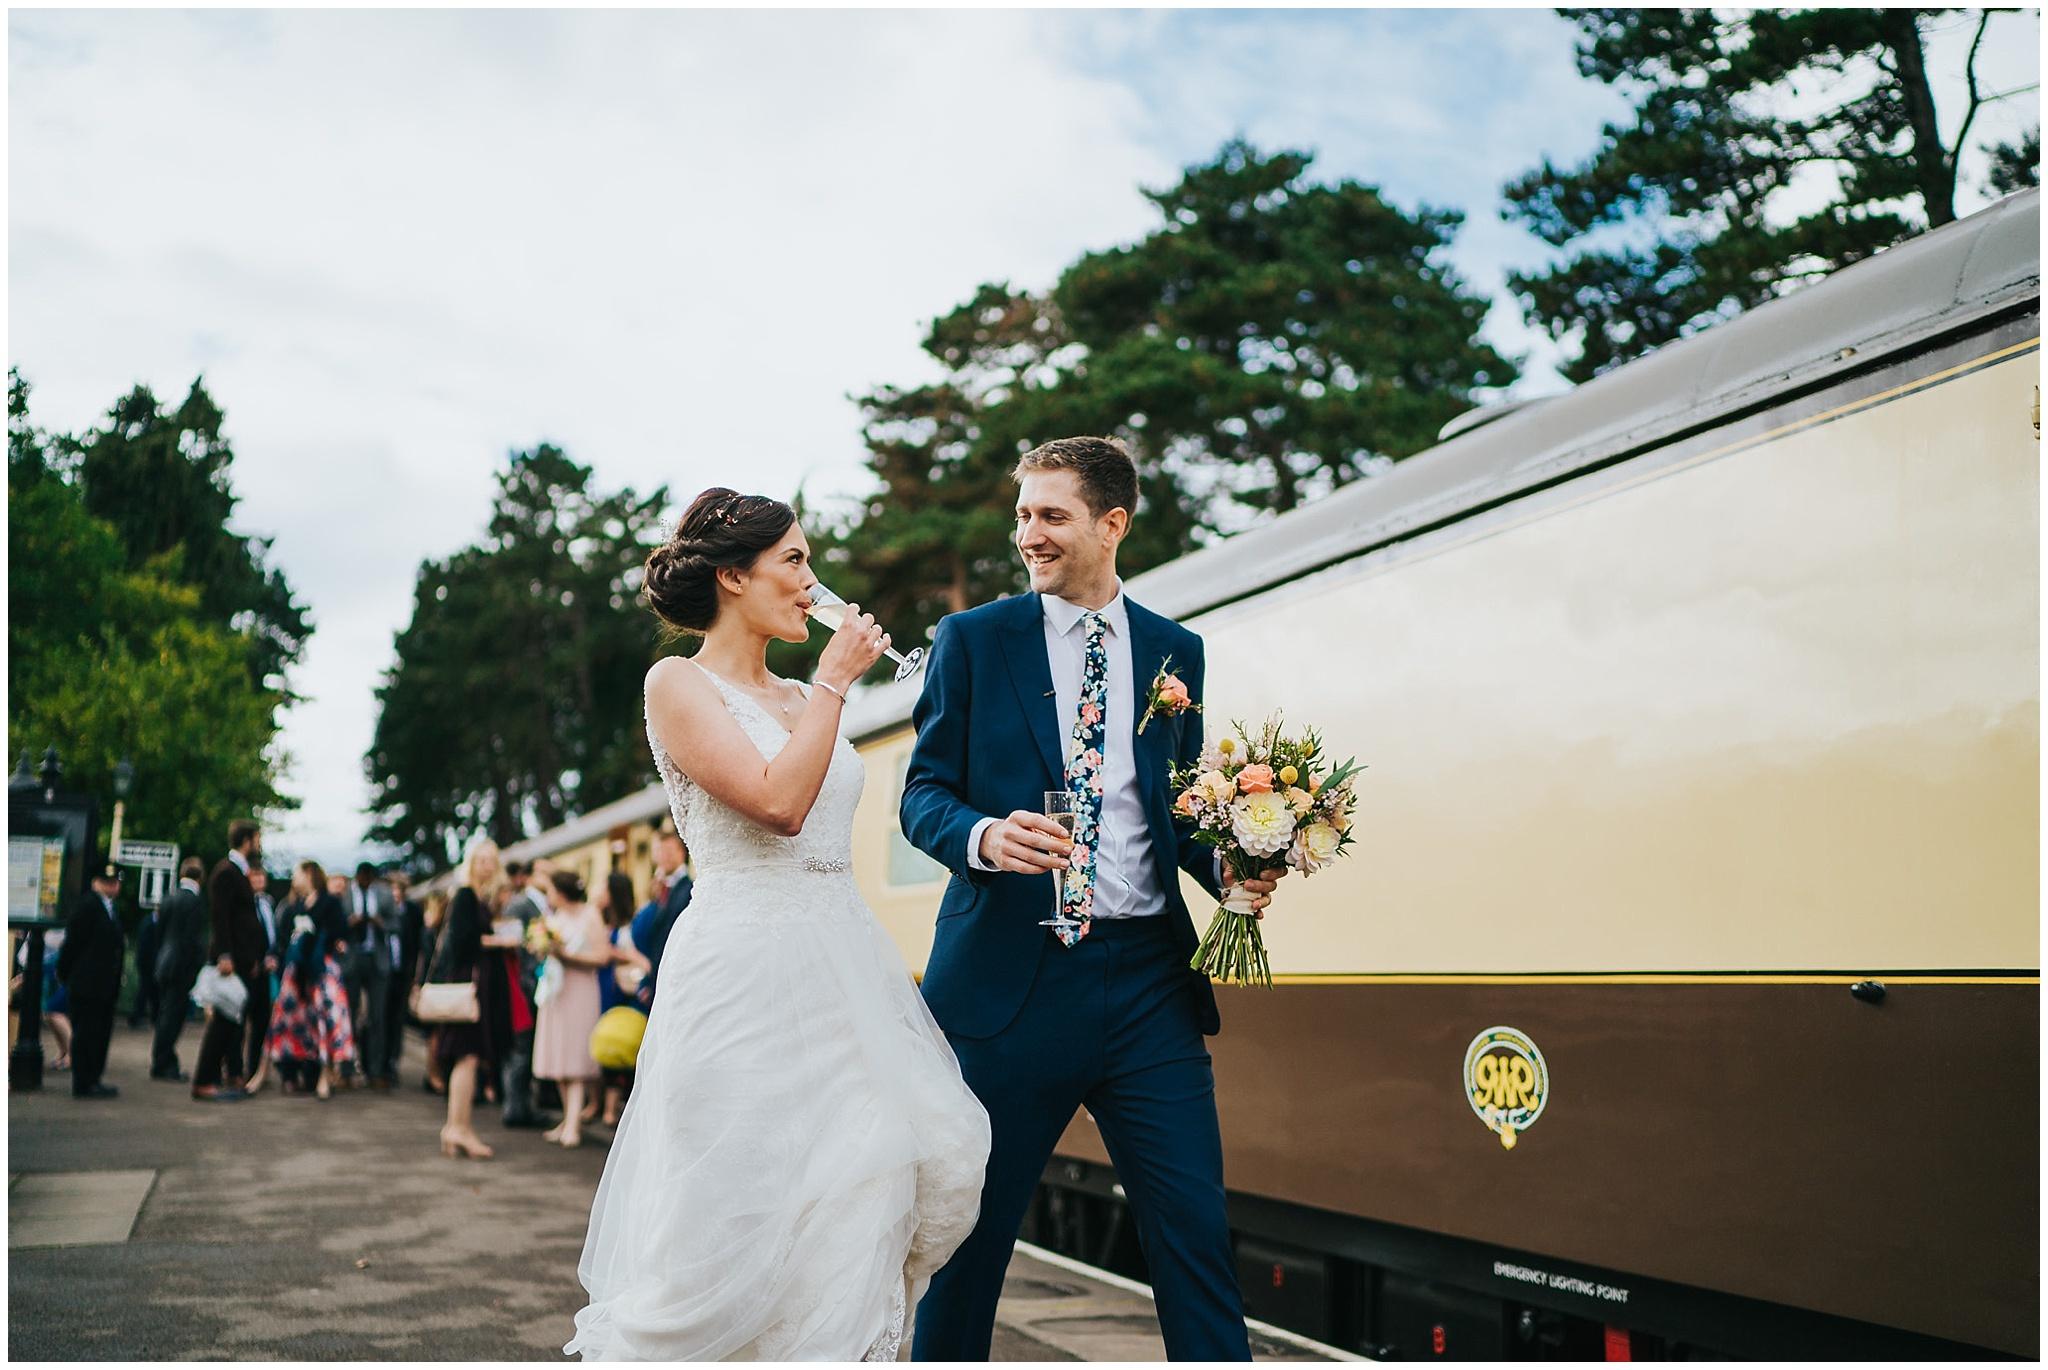 Stanway House Gloucester wedding photography041